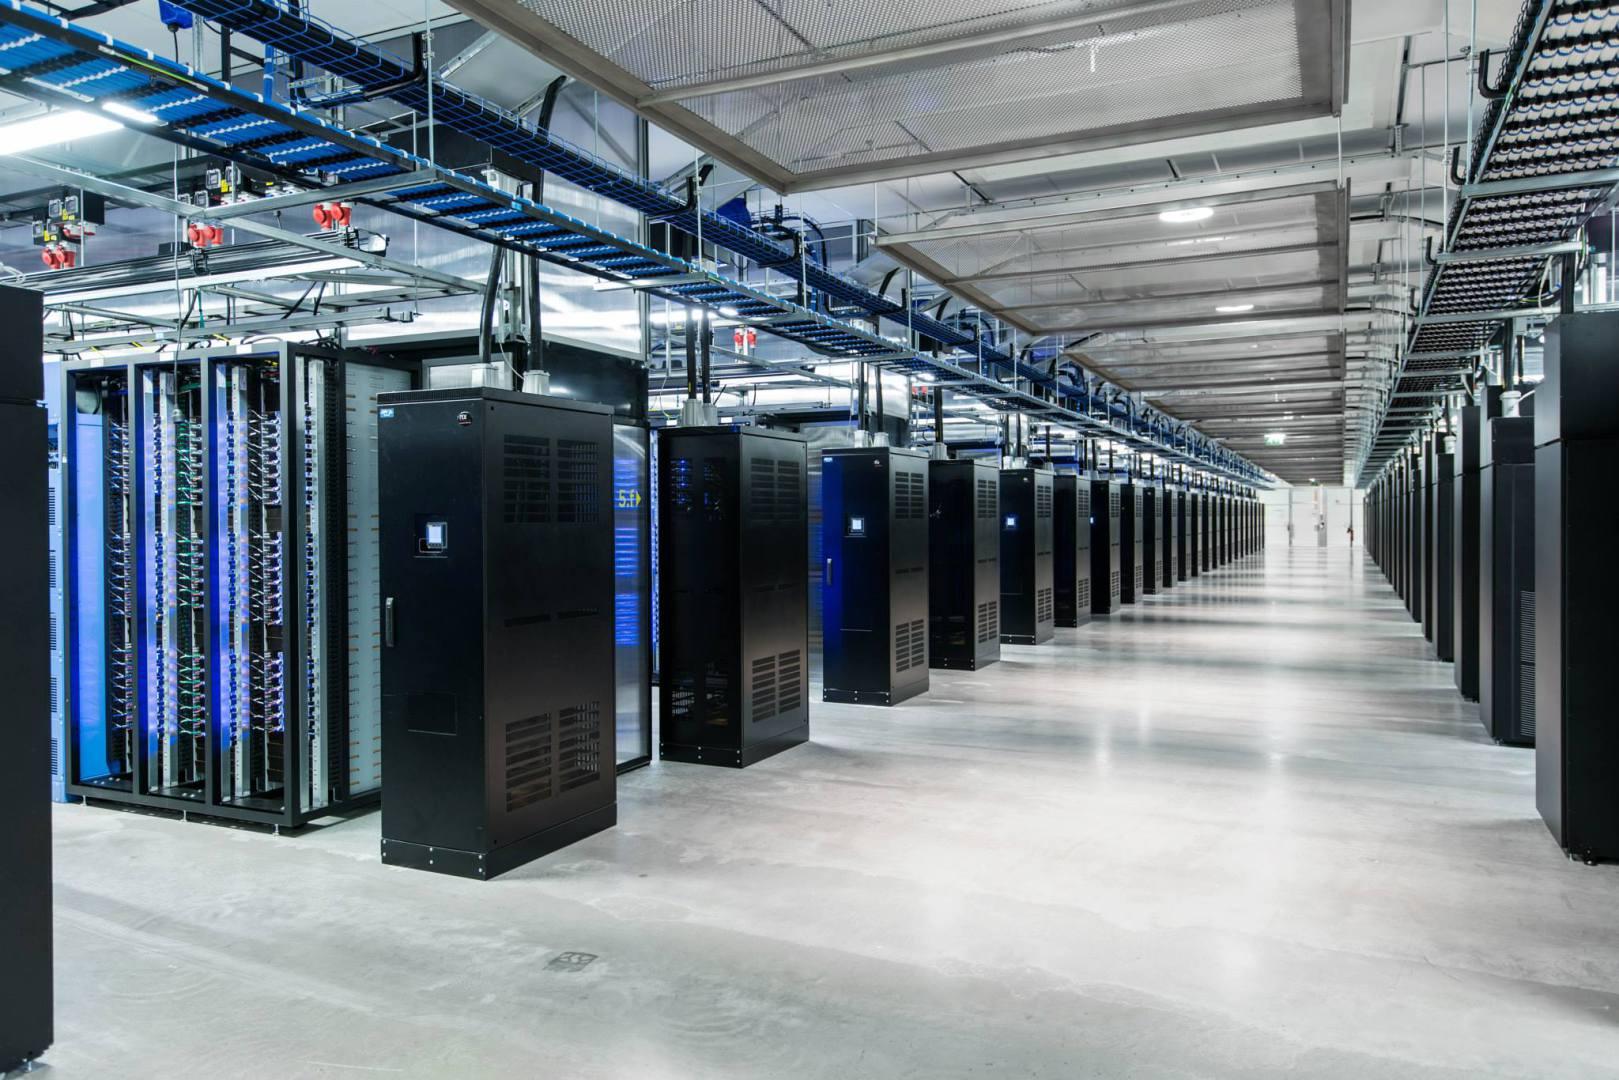 Facebook data center in Lulea, Sweden